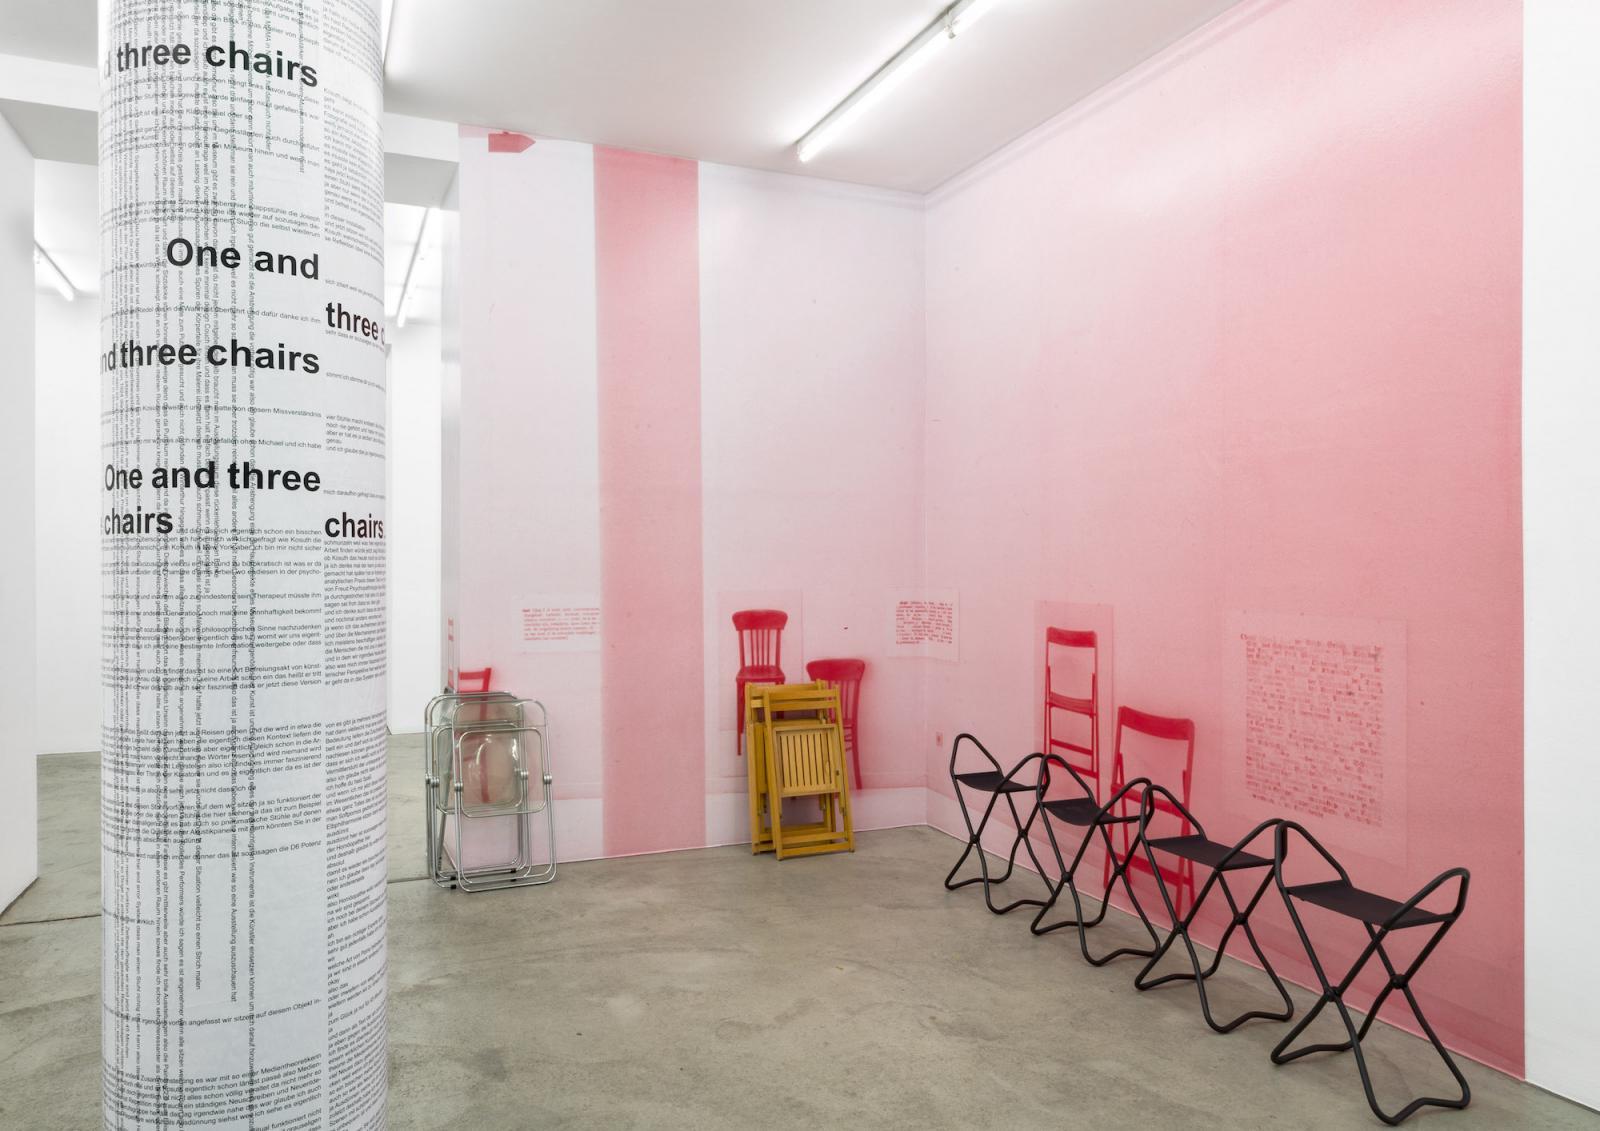 """One and three chairs"" (installation view, 2017) Photo: Iris Ranzinger; Courtesy Gabriele Senn Galerie  ""One and three chairs"" curated by Sabine Schaschl and Michael Riedel,  Gabriele SennGalerie"